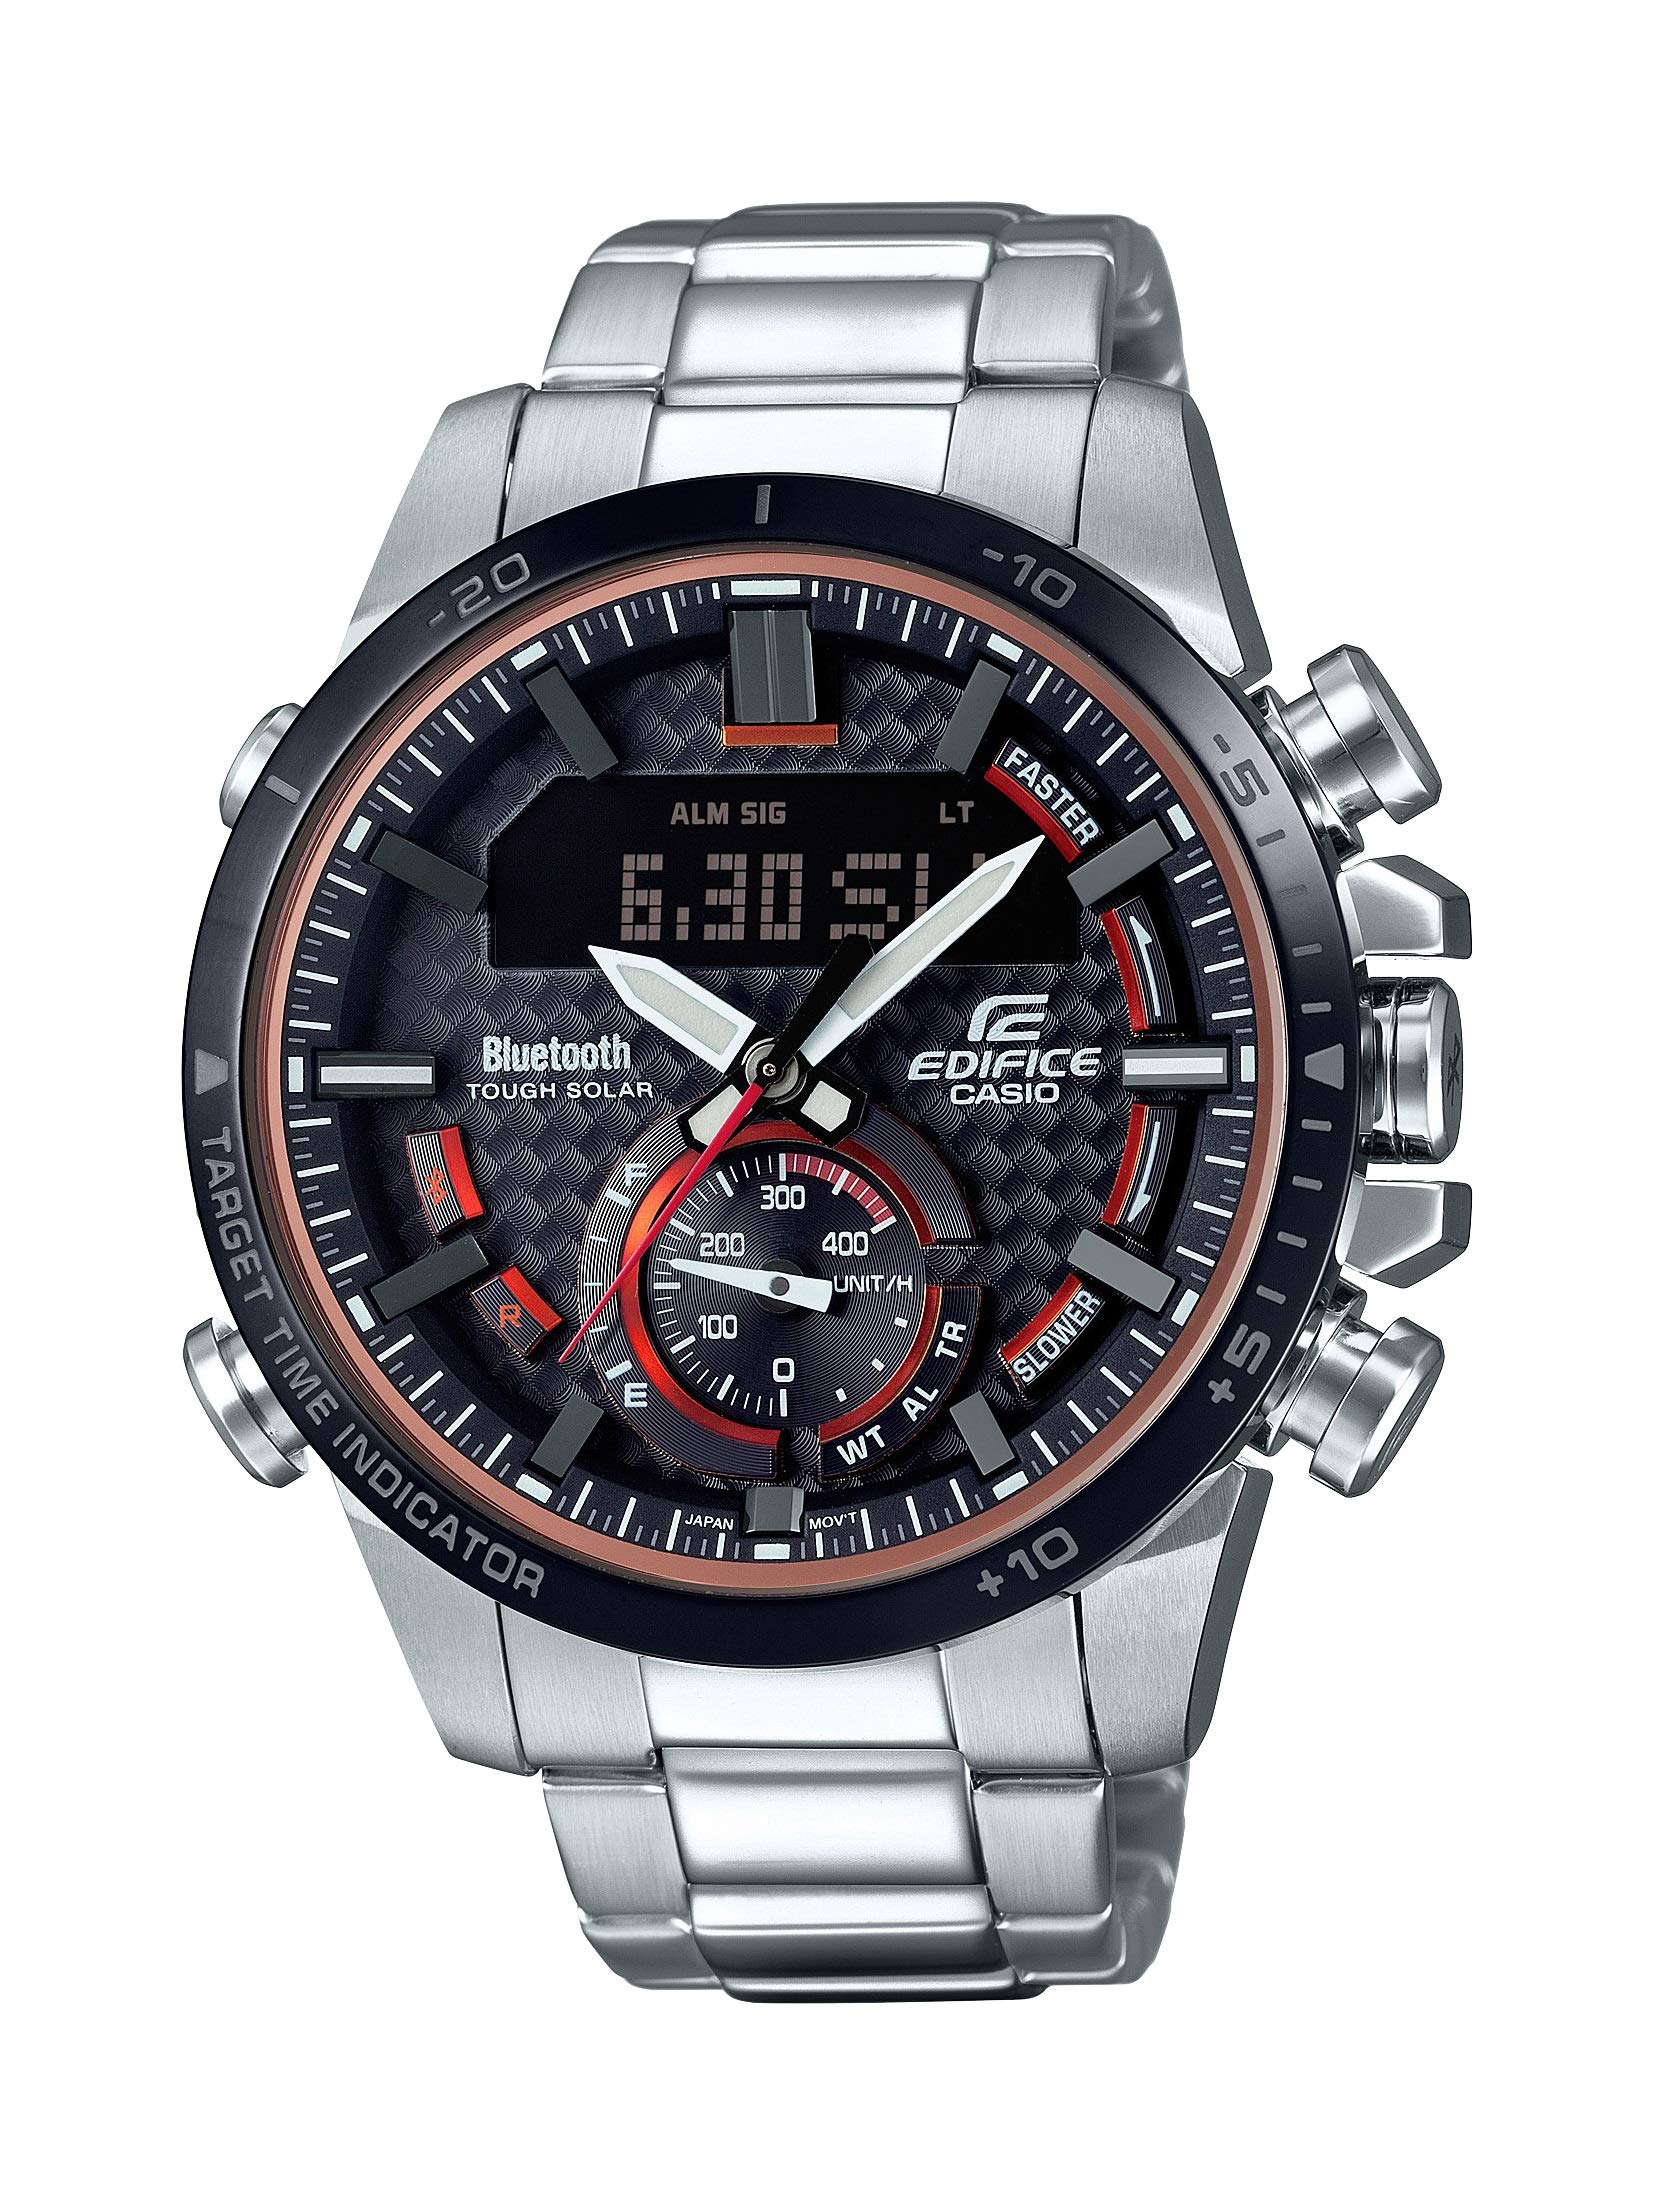 ویکالا · خرید  اصل اورجینال · خرید از آمازون · Casio Men's 'Edifice' Quartz Stainless Steel Watch, Color:Silver-Toned (Model: ECB-800DB-1ACF) wekala · ویکالا